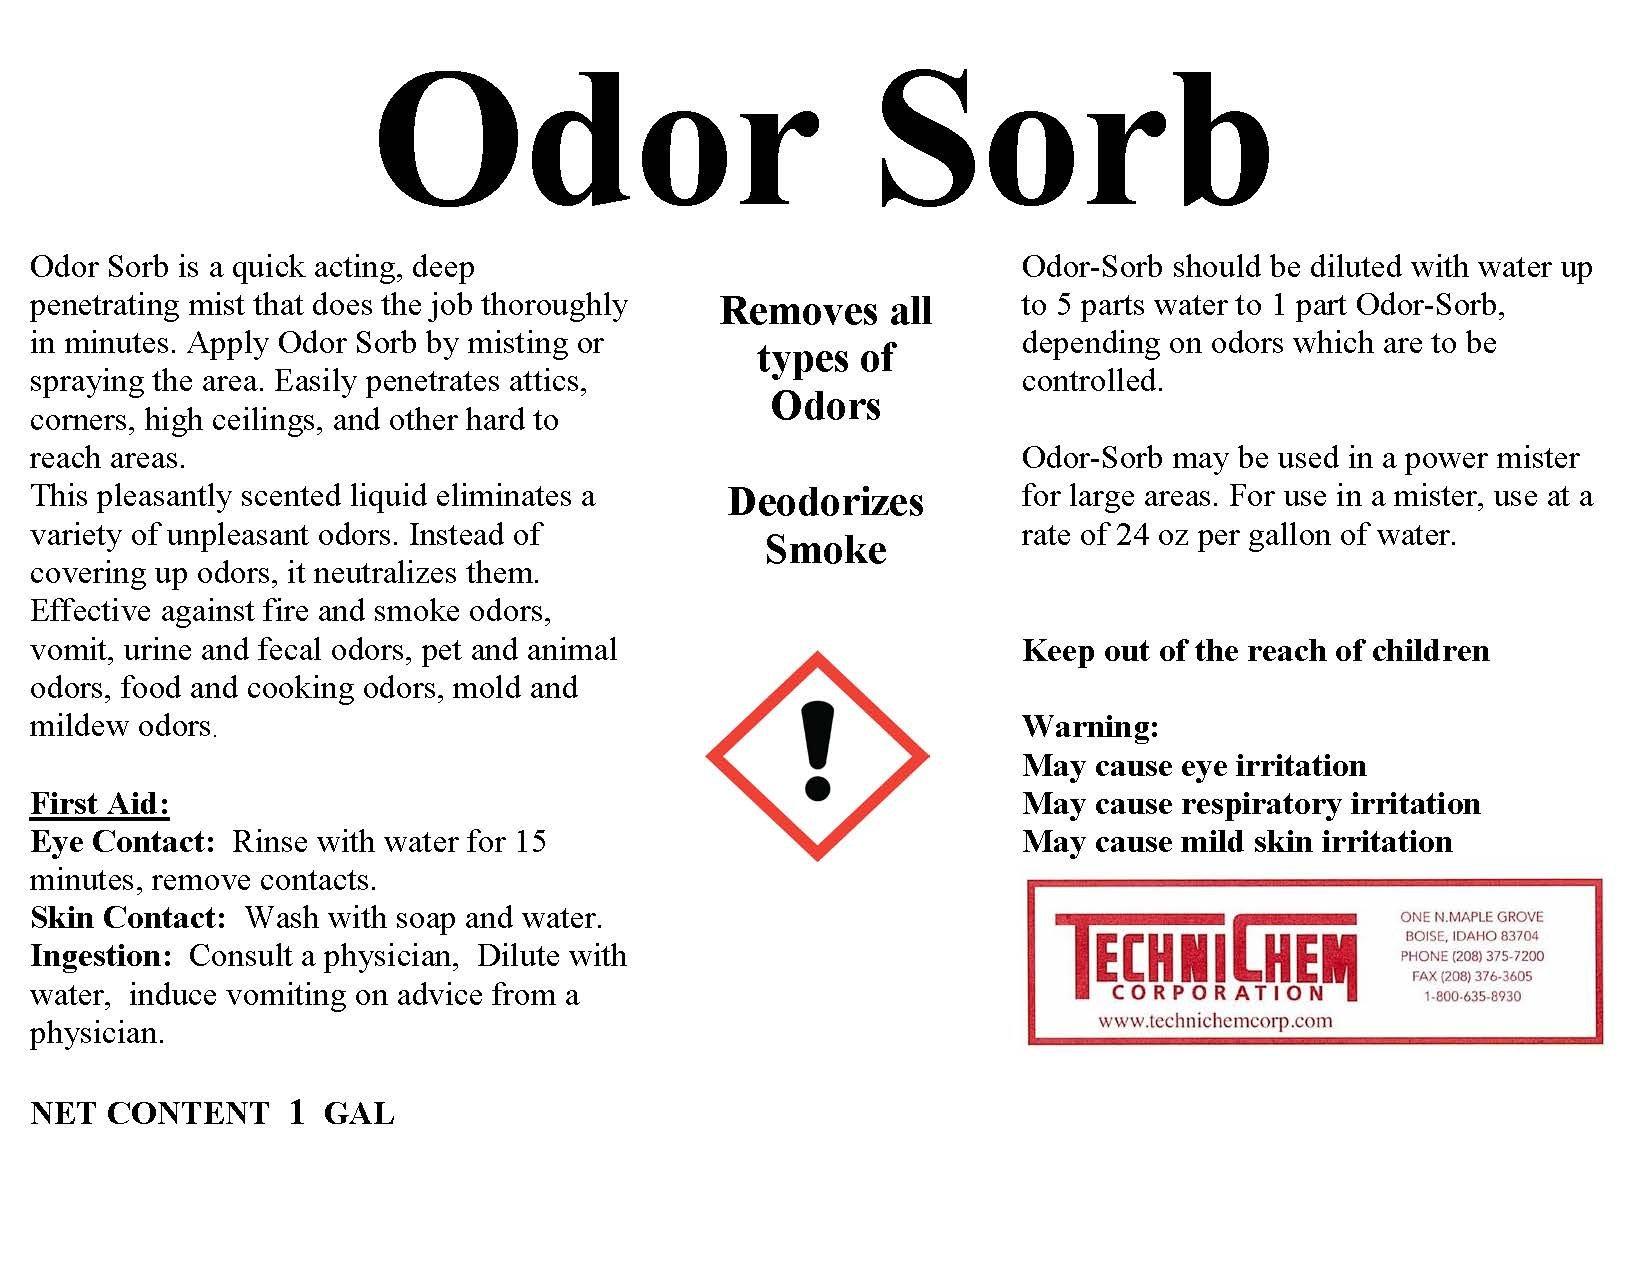 Technichem Corporation ODOR SORB Liquid Bulk Deodorant (1-6 Gallon Pail)